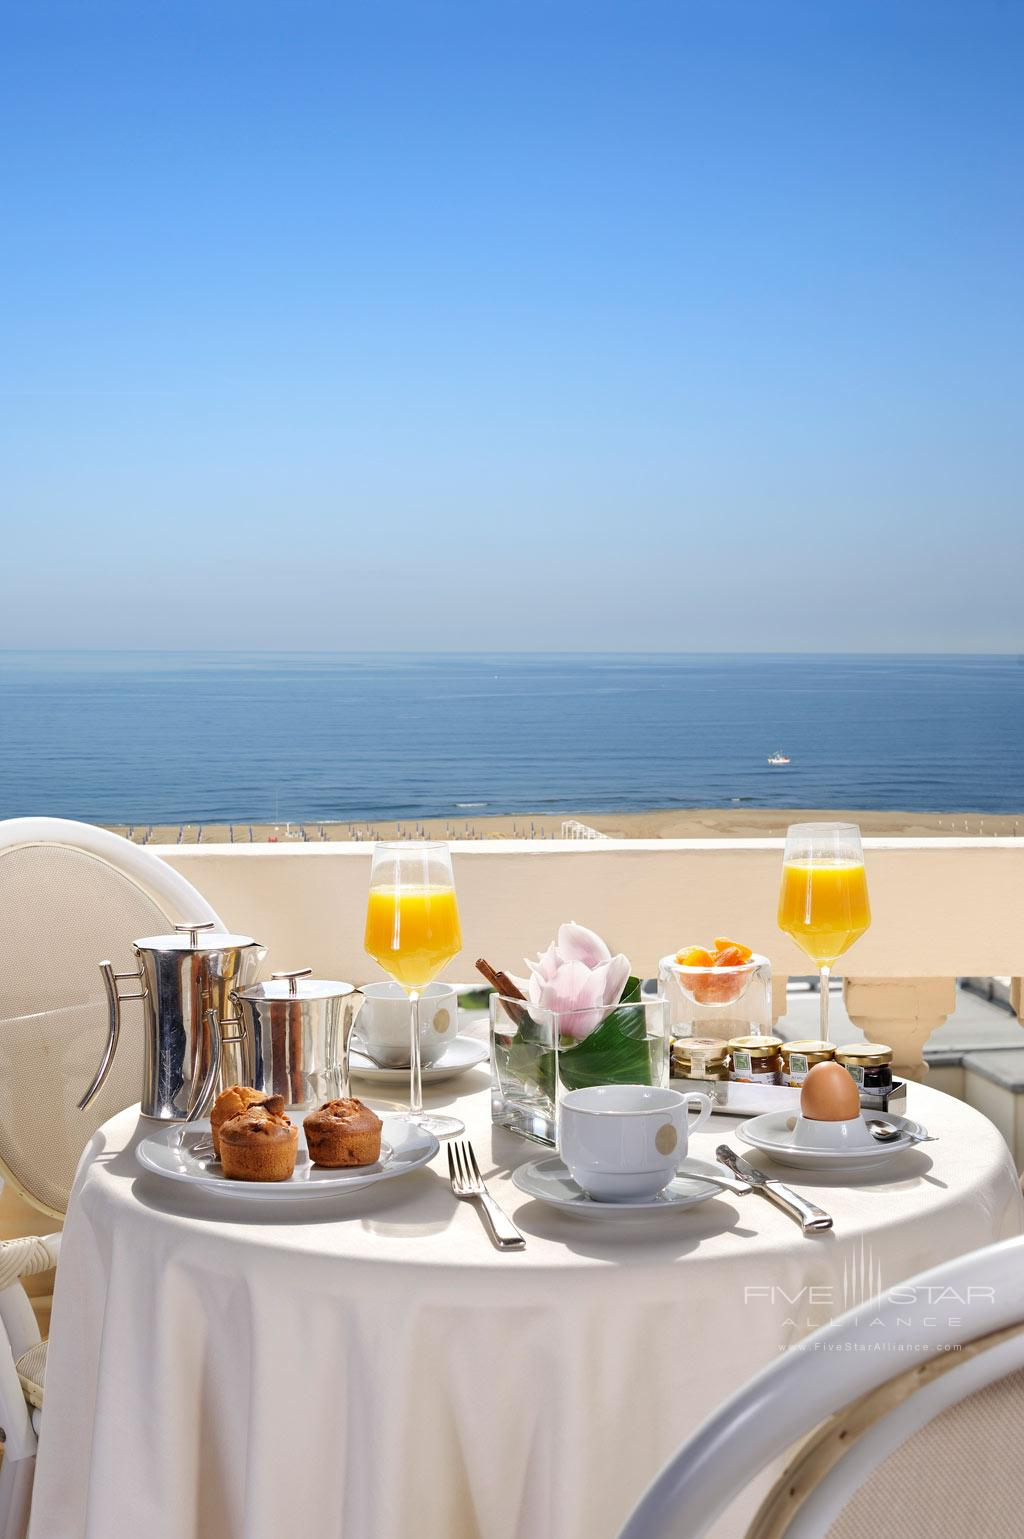 Have a Quiet Room Service Order at Grand Hotel Principe di Piemonte, Viareggio LU, Italy